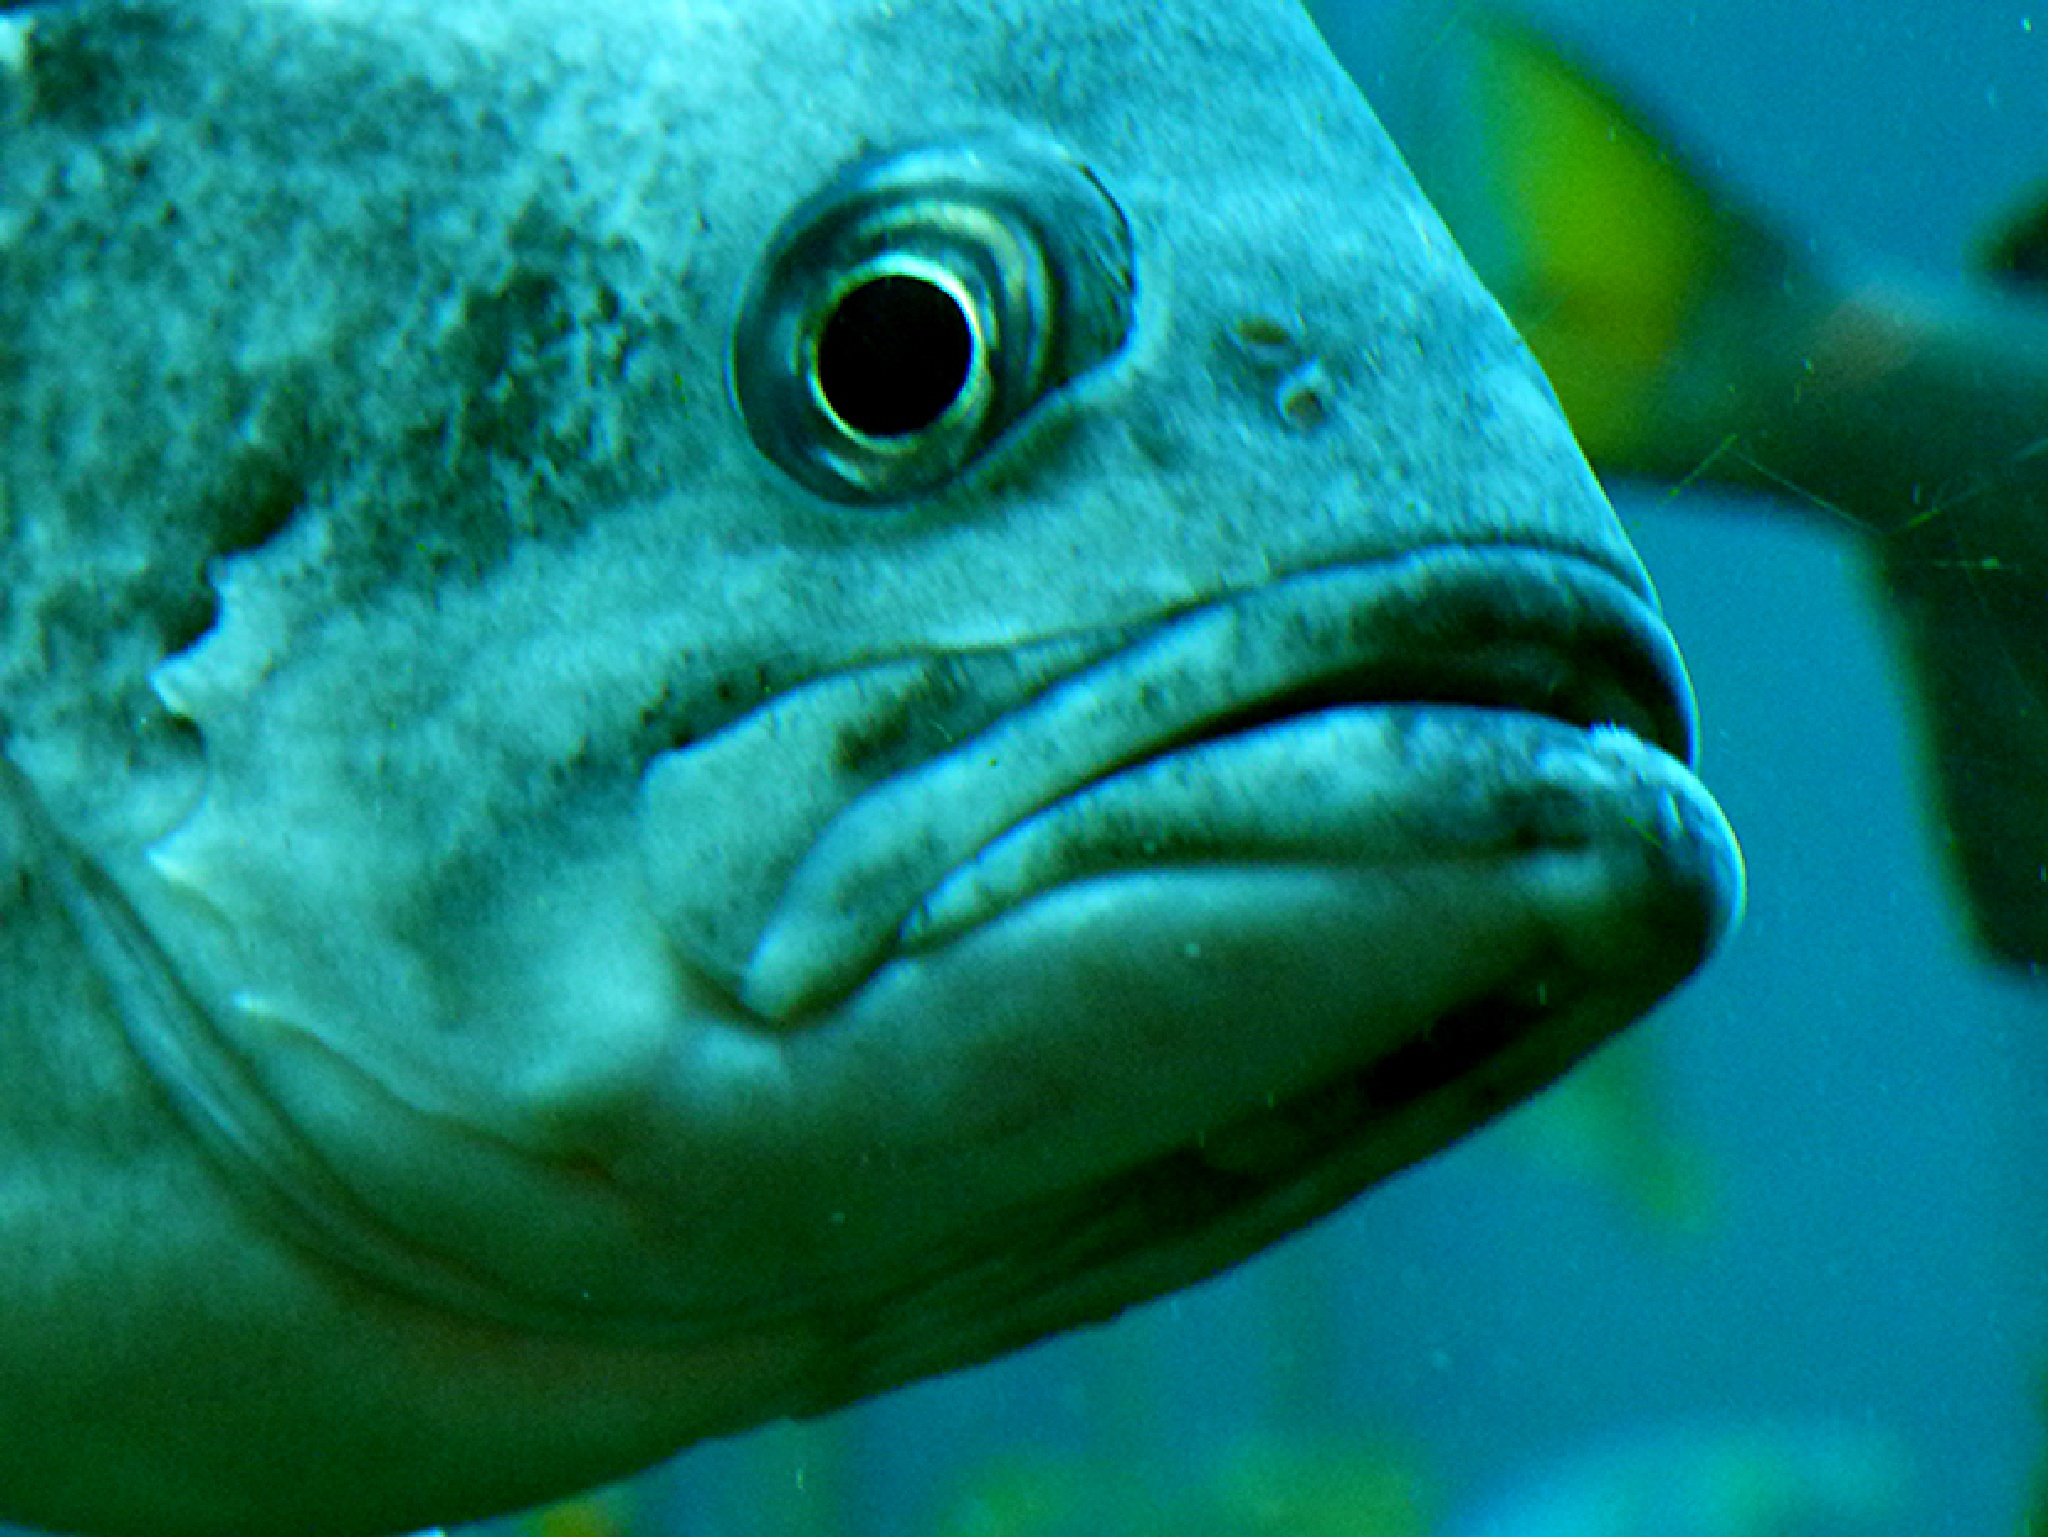 Fish eye by Sereniti1952